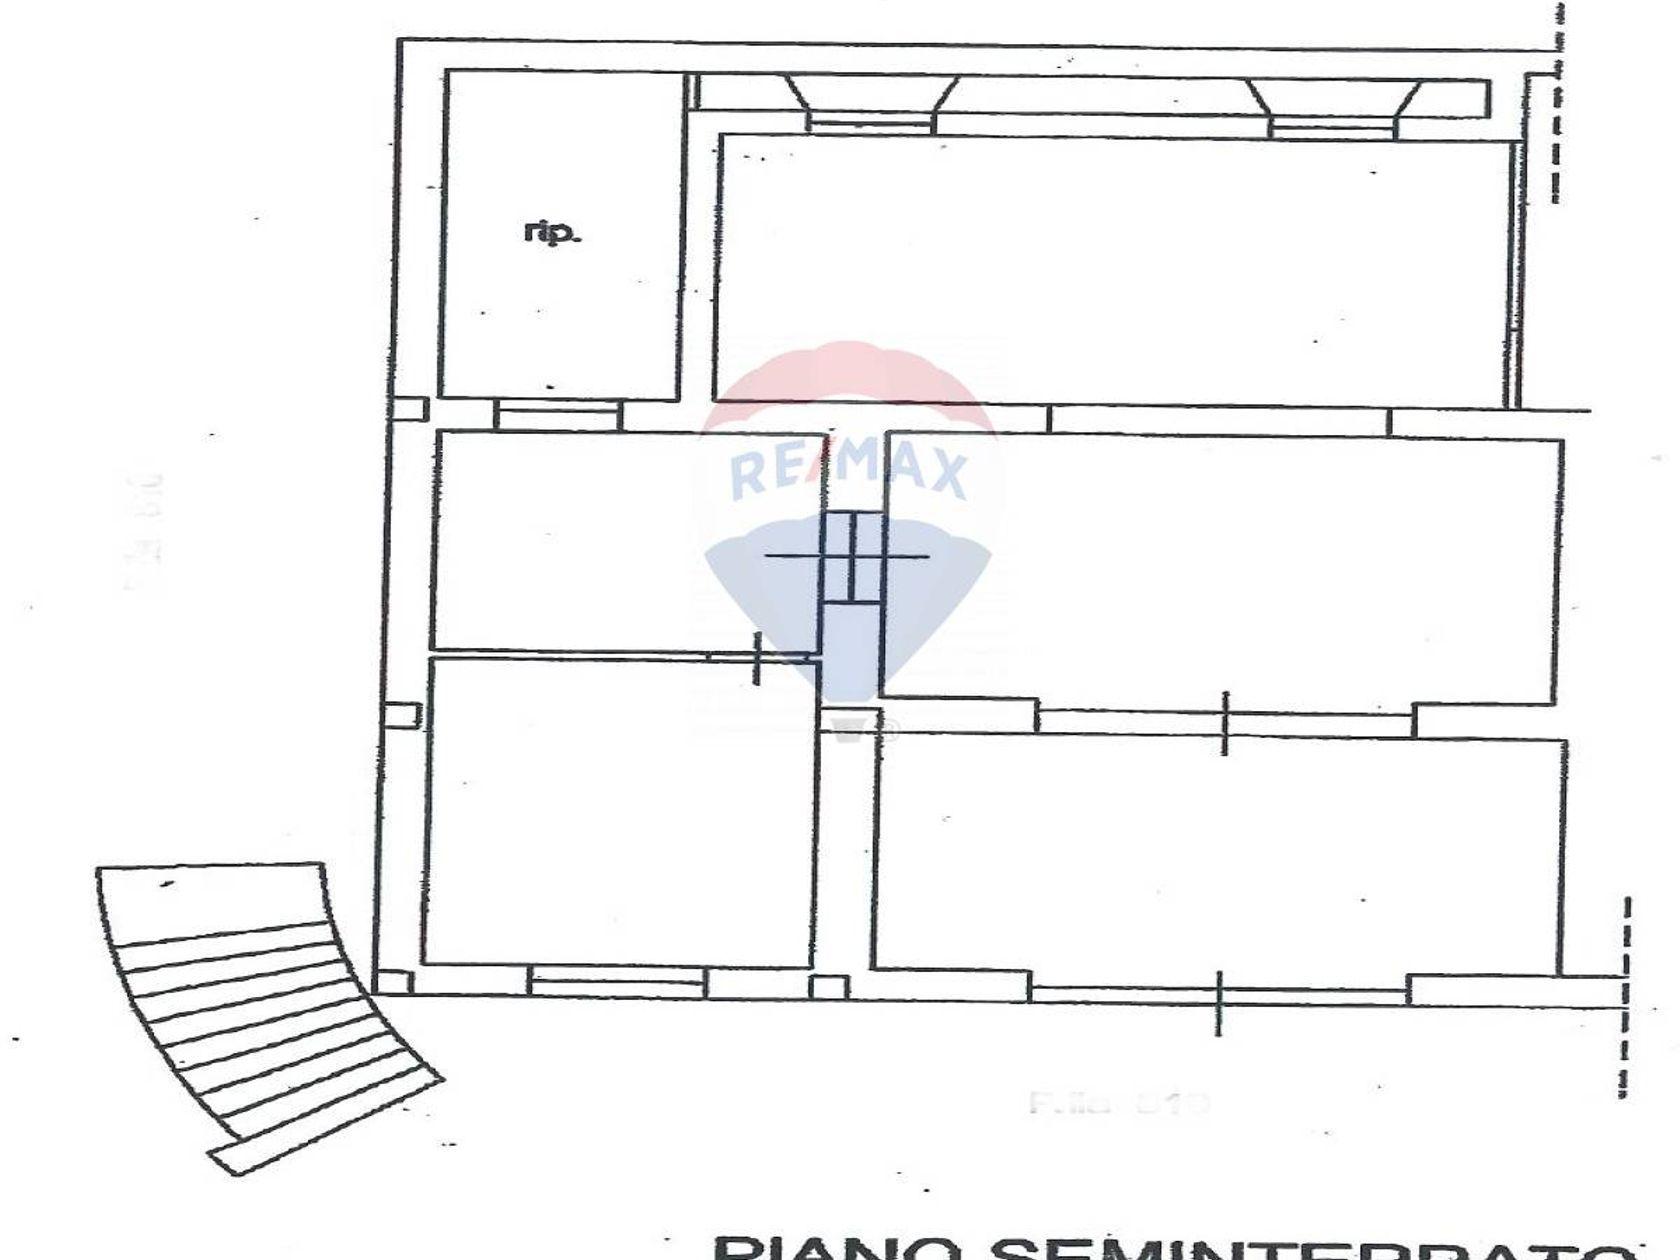 Villa singola Spigno Saturnia, LT Vendita - Planimetria 1